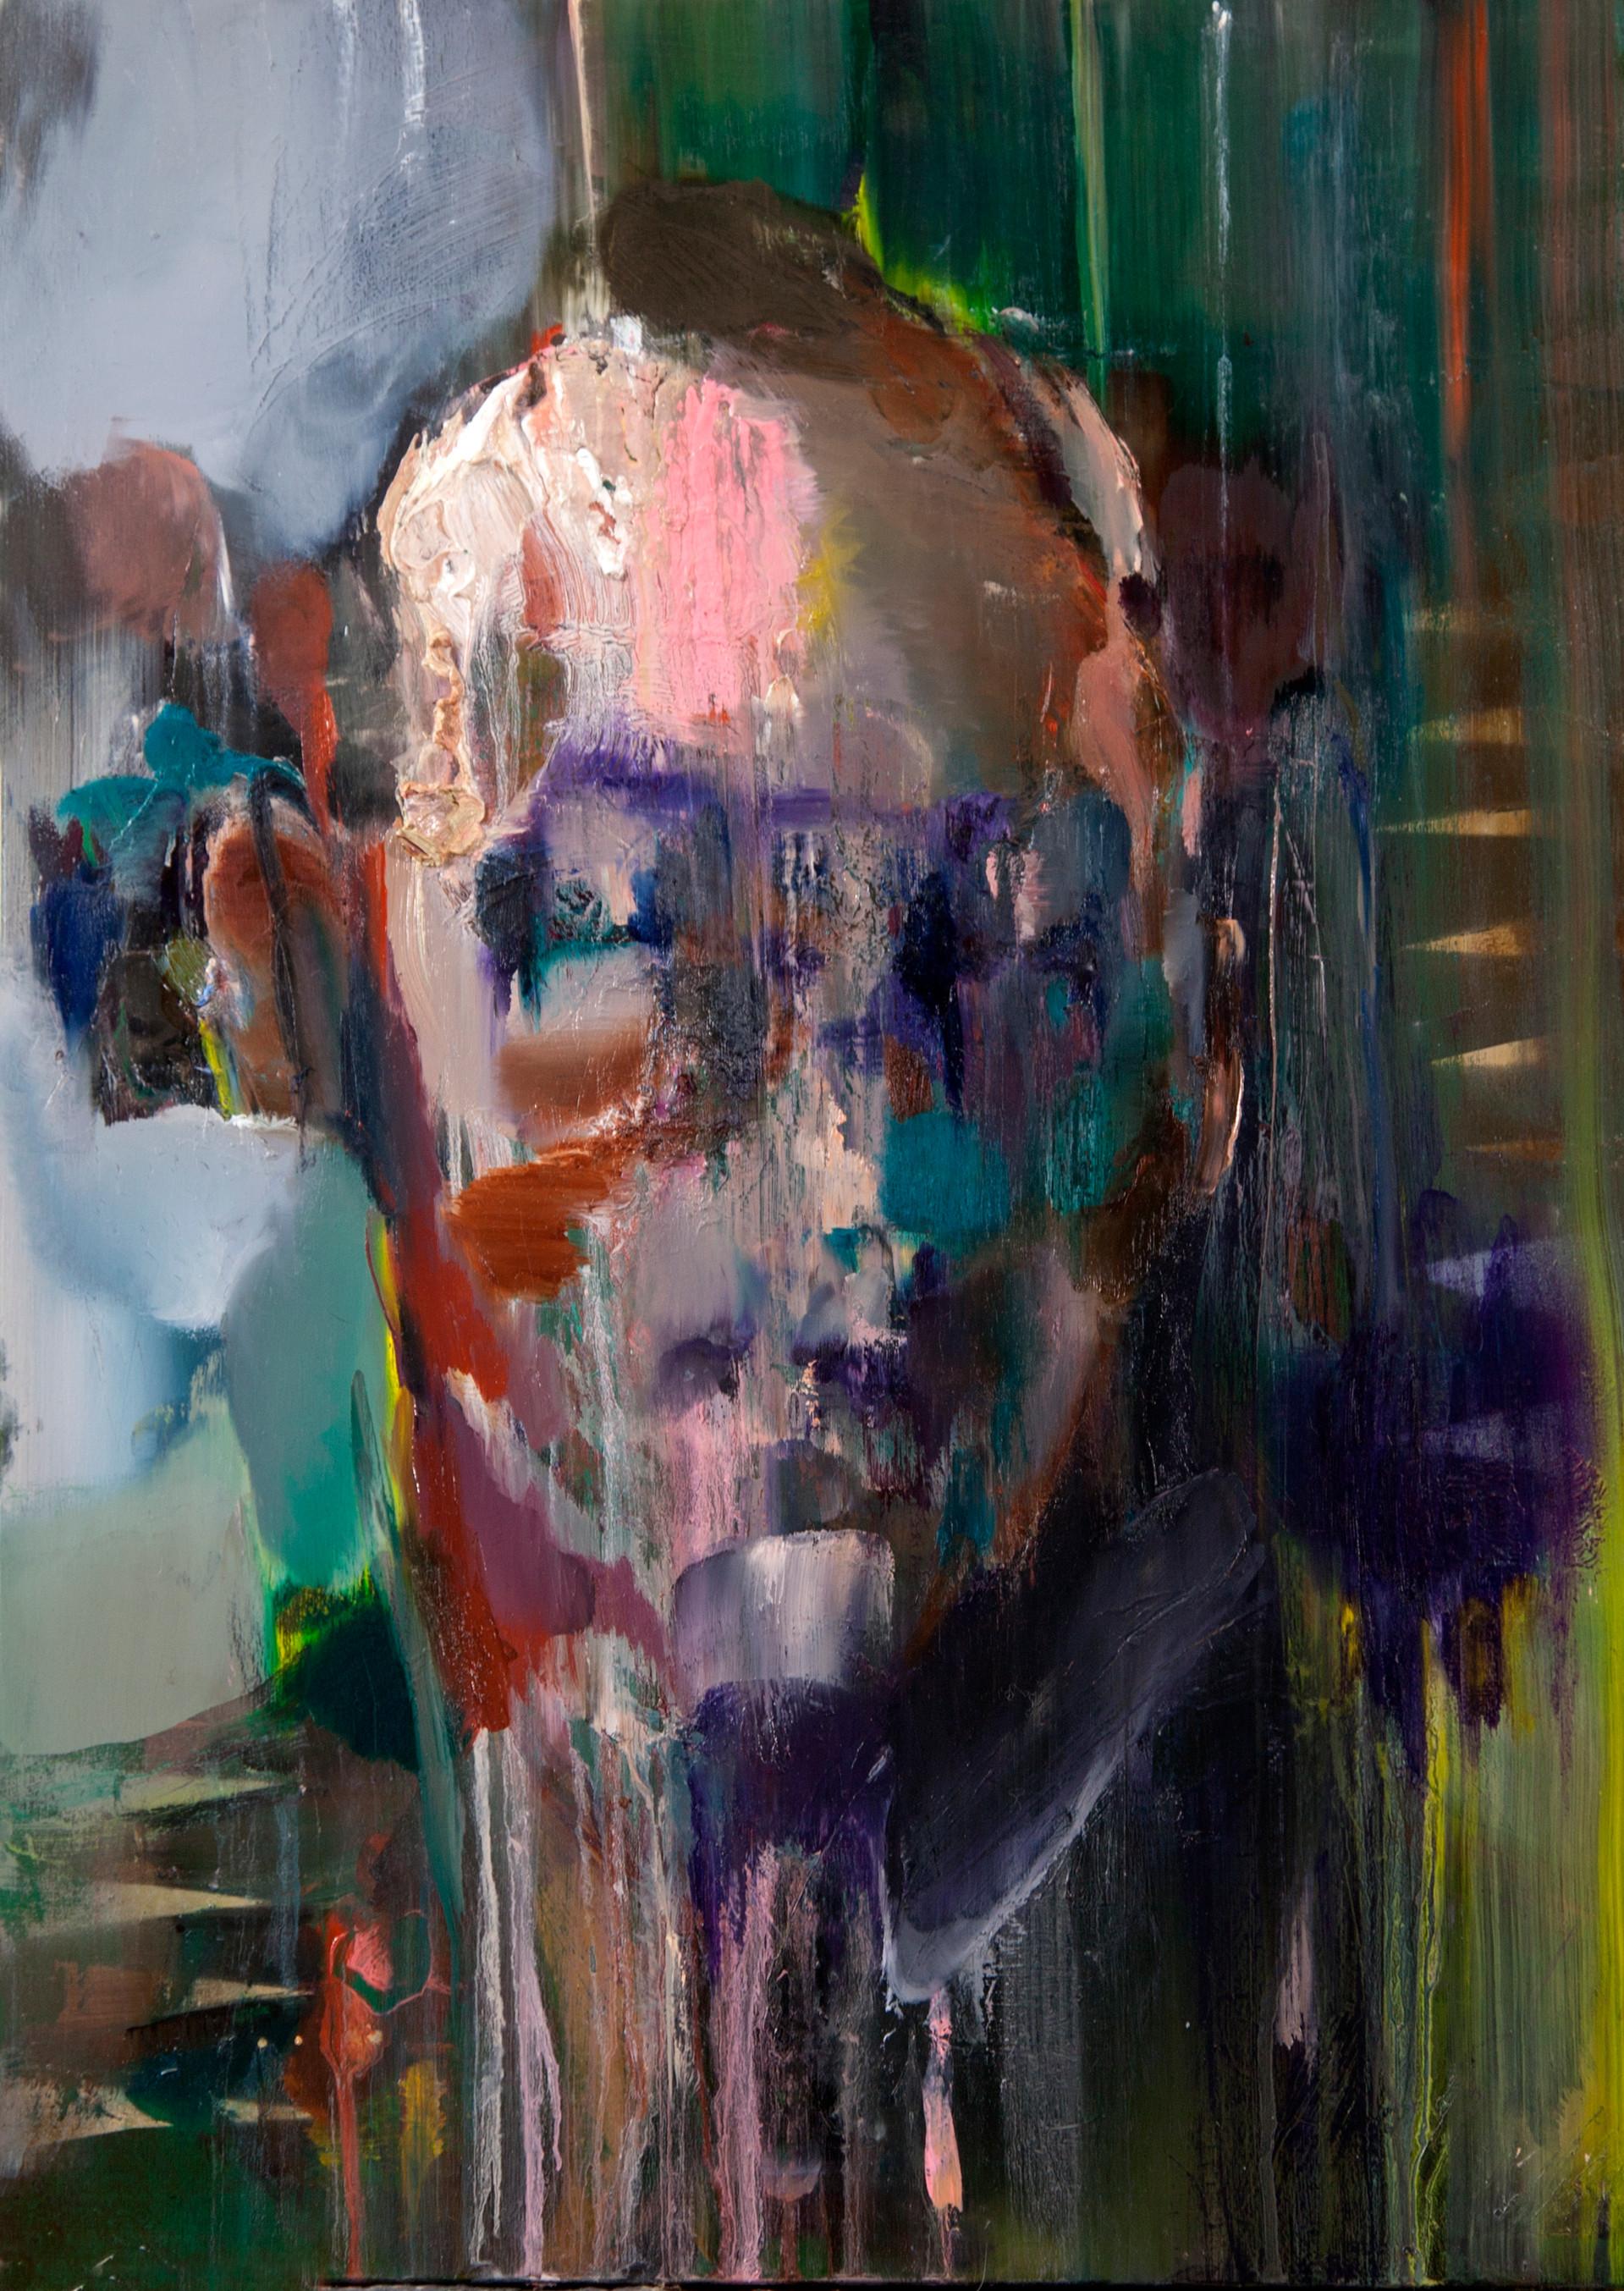 funker, 70 x 50 cm, oil on wood, 2017